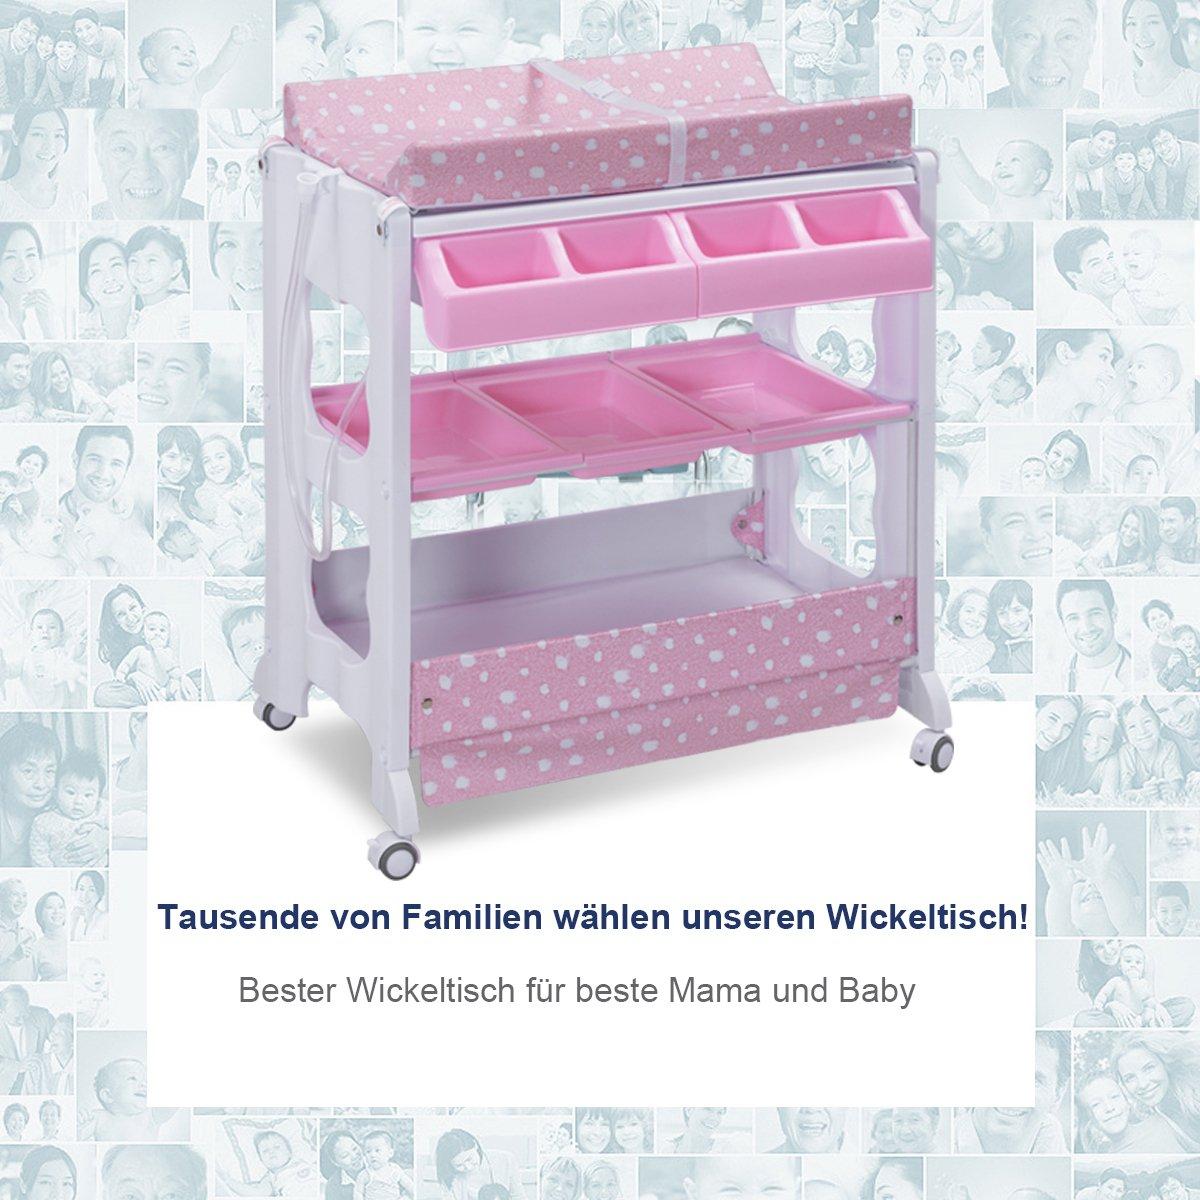 COSTWAY 2 in 1 Mobiler Wickeltisch Badewanne rosa Wickelkombination Wickelauflage Kommode  Wickelregal Wickelkommode Baby Bade